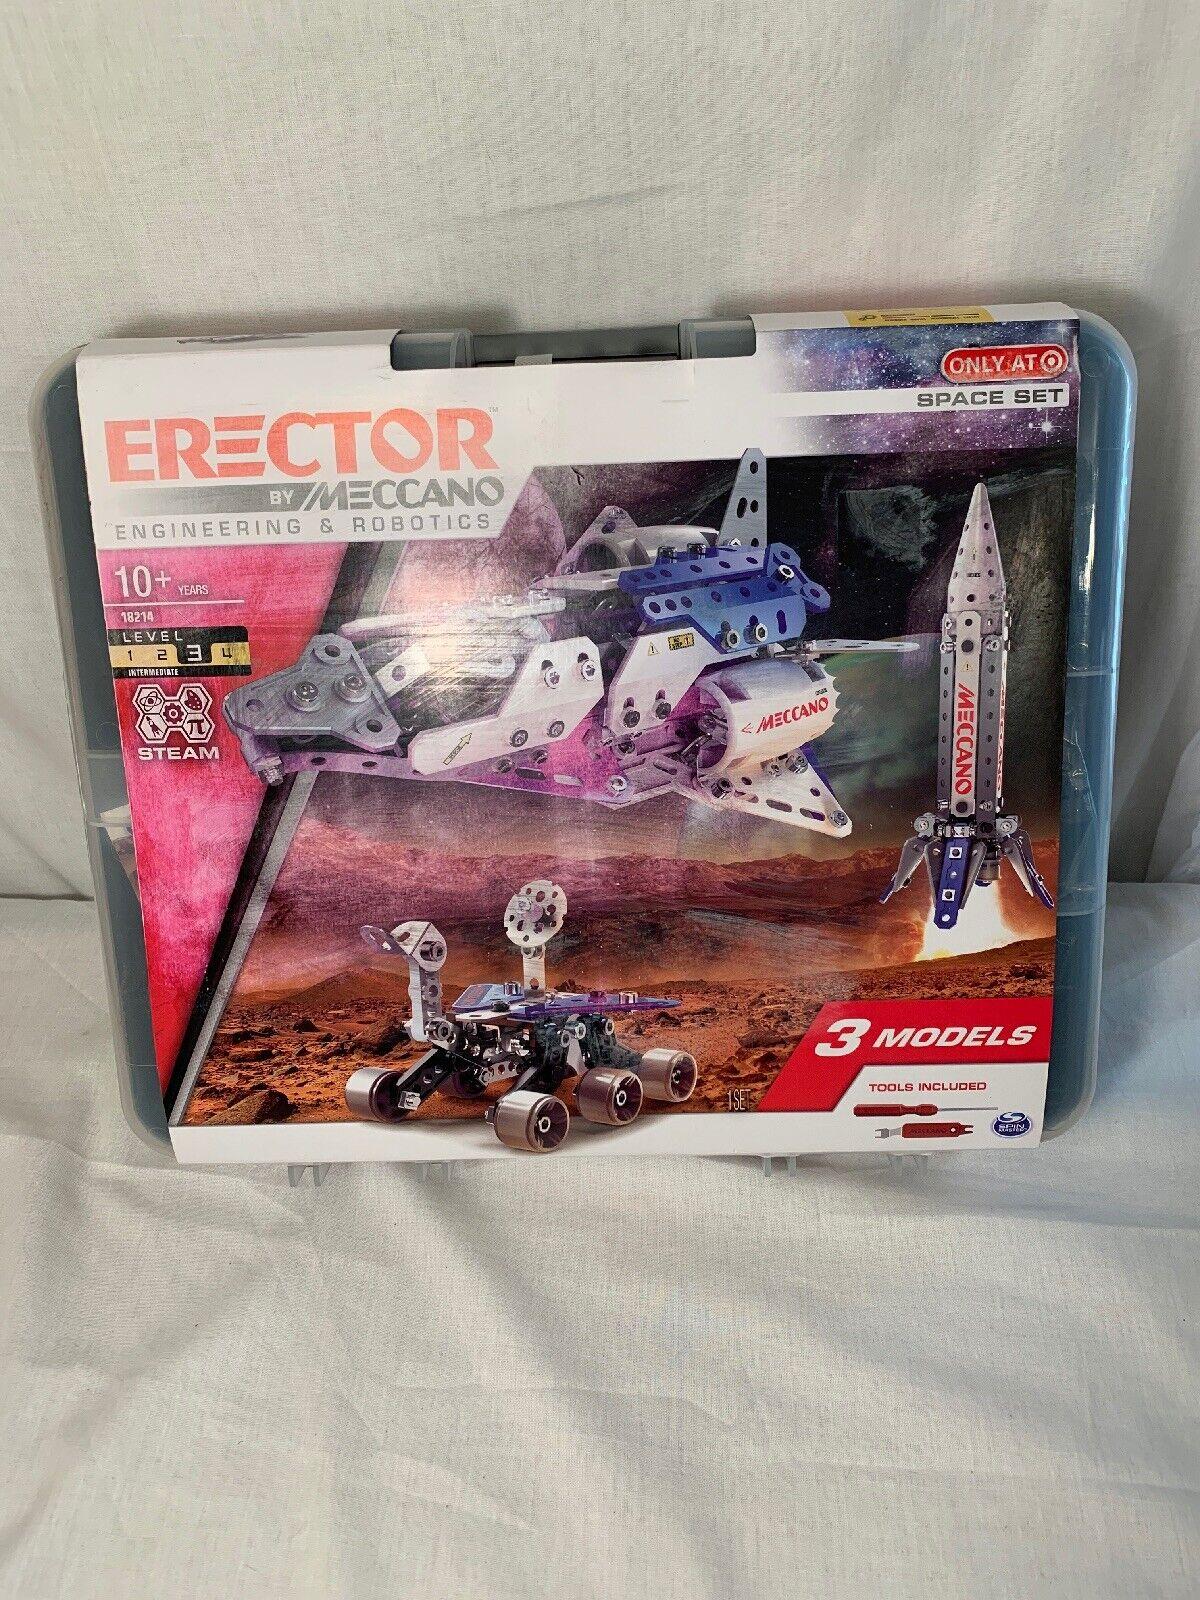 Meccano Erector 18214 Engineering & Robotics Space Set new with damaged box